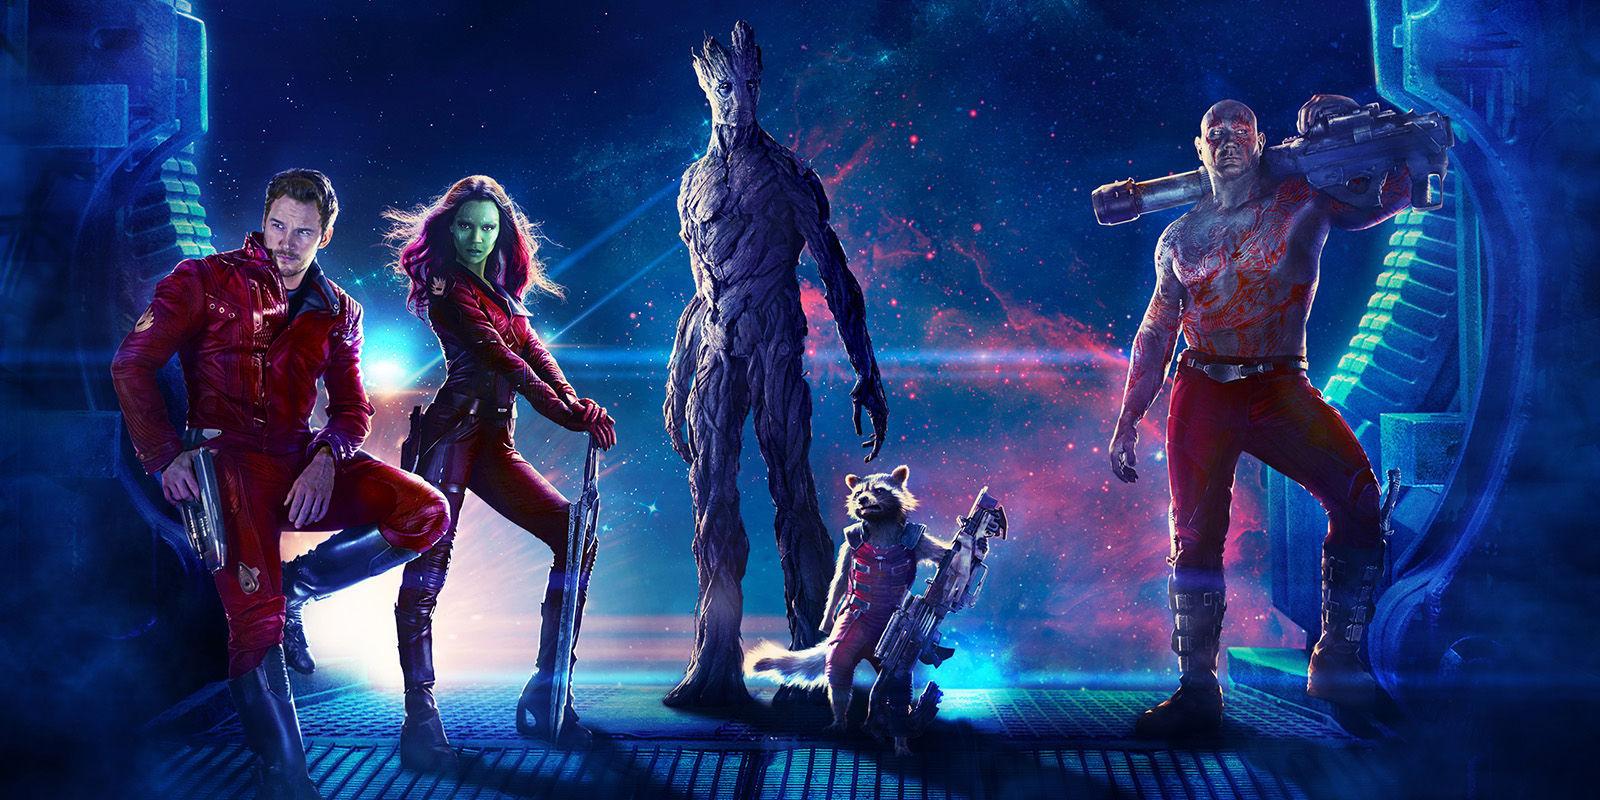 Guardians Of The Galaxy Vol 2 Wallpaper: Director's Chair Vacant For Guardians Of The Galaxy 3